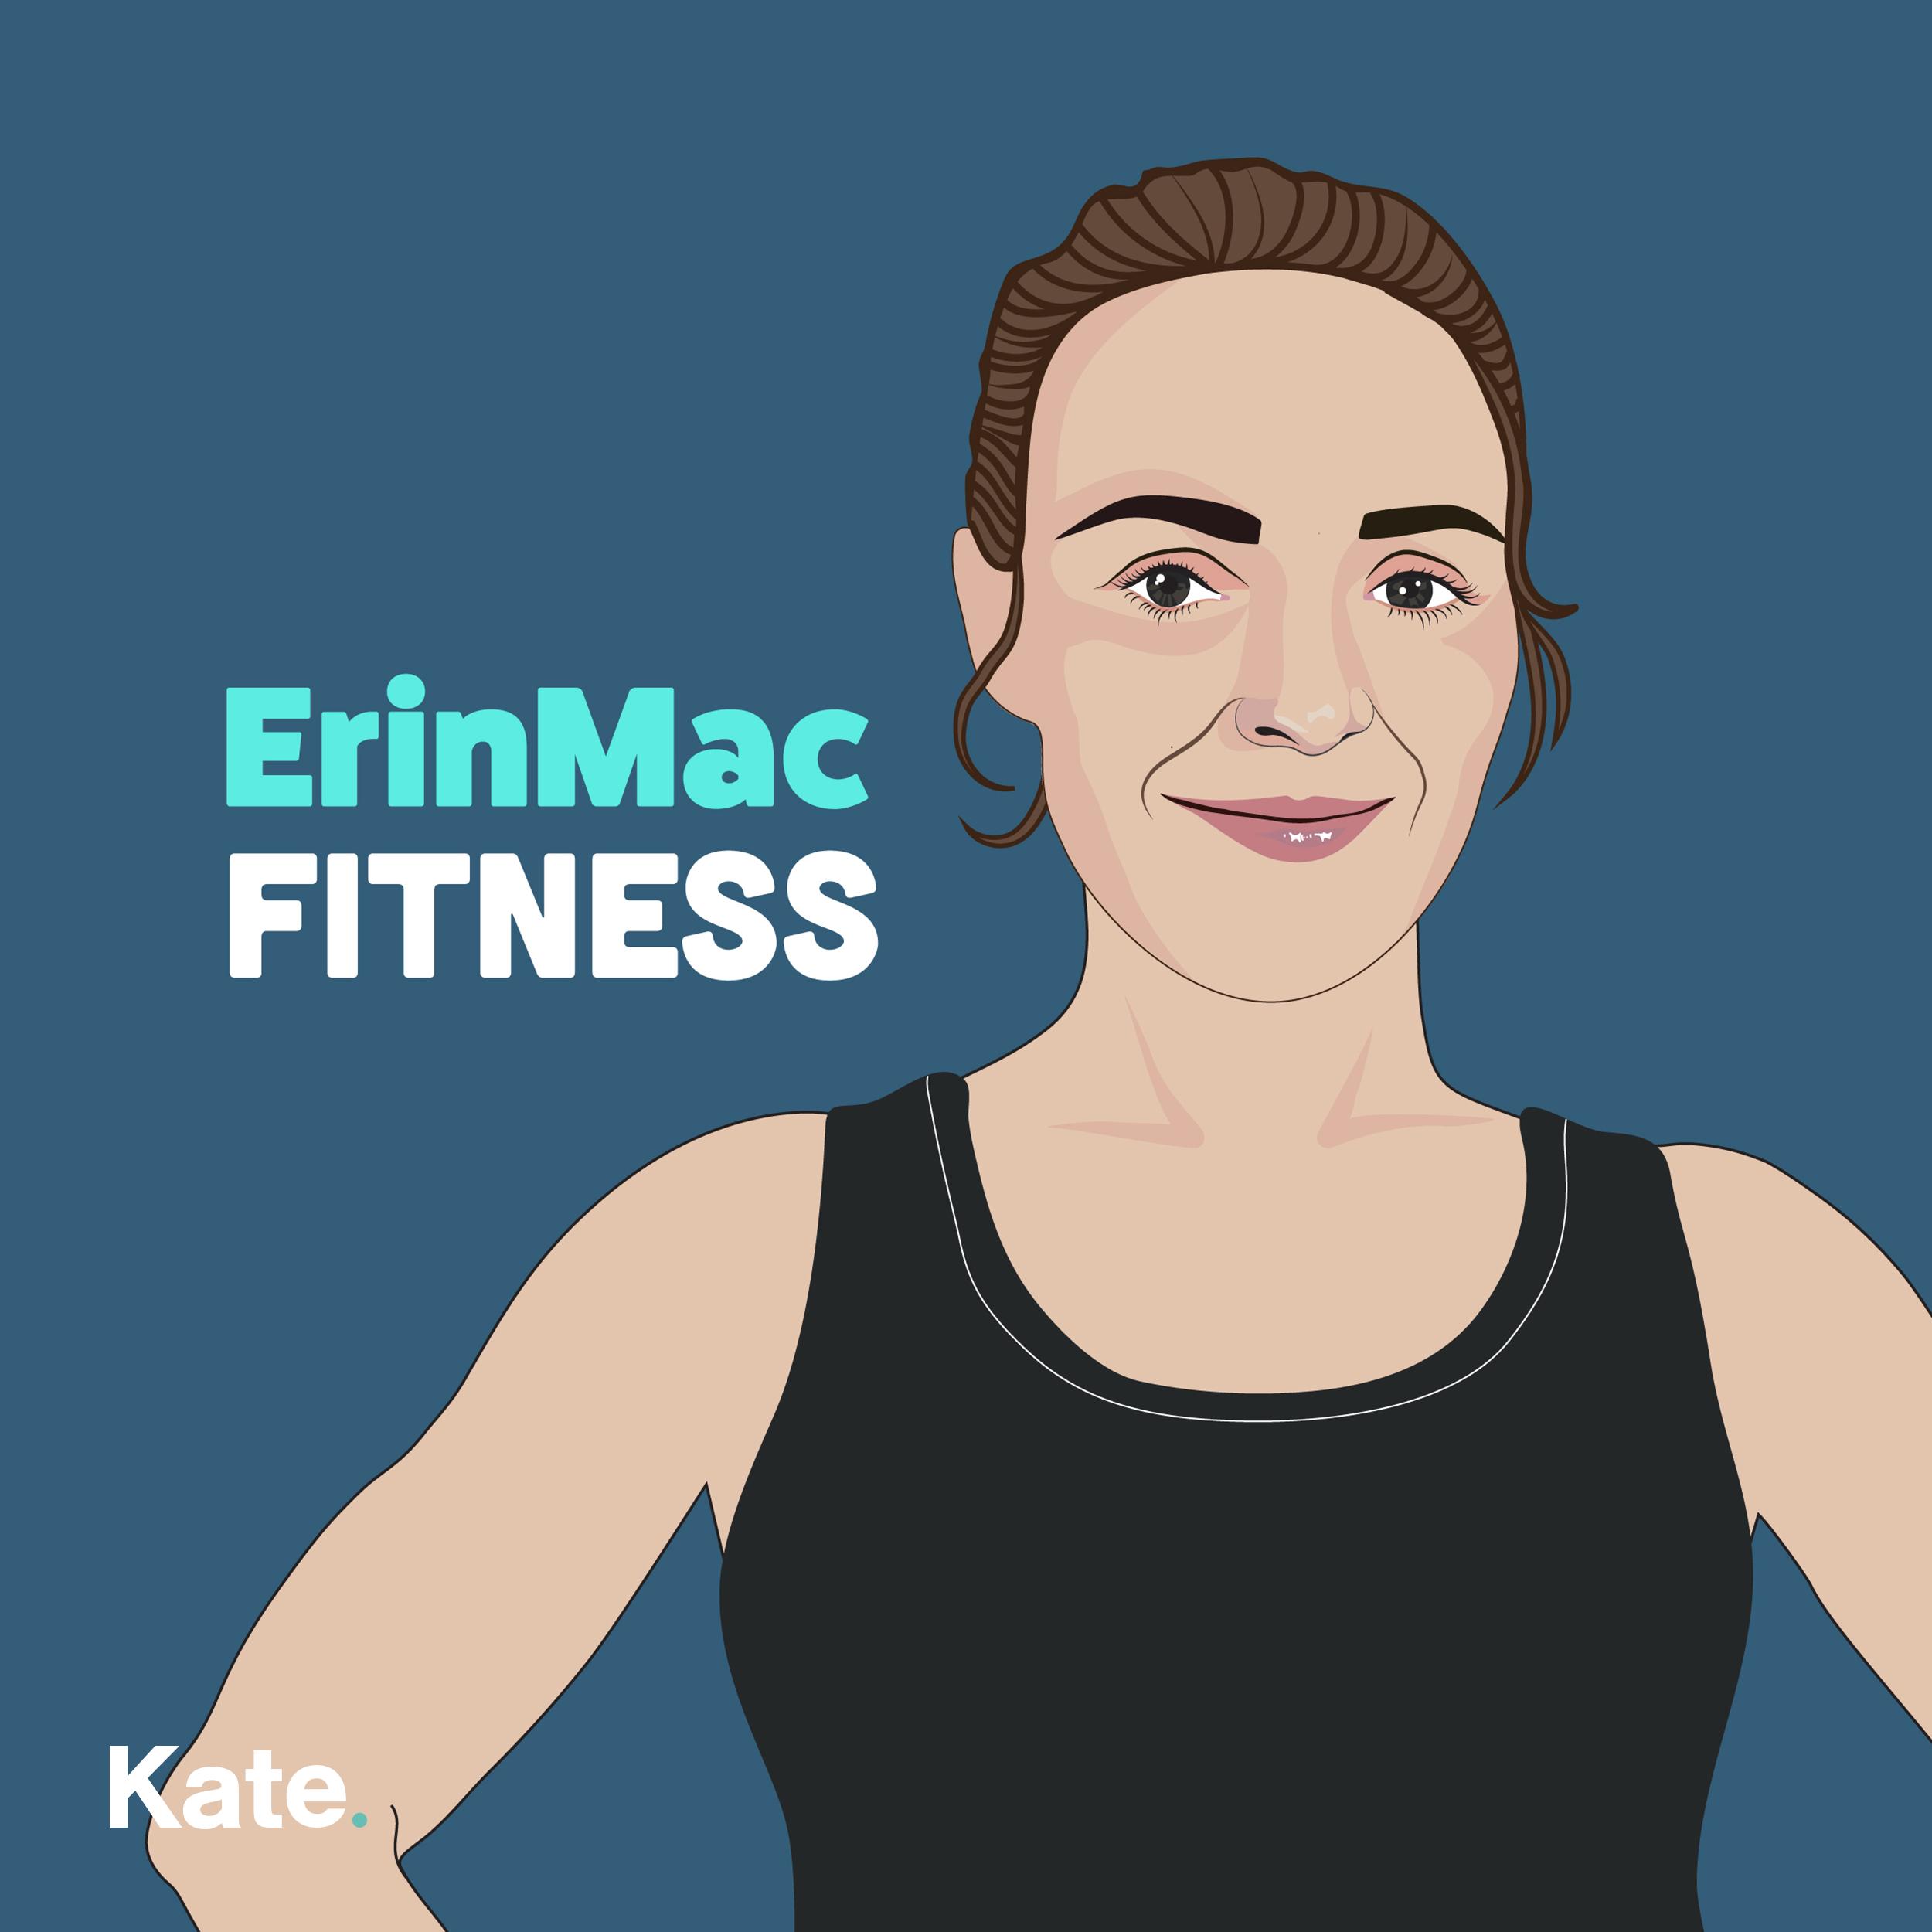 ErinMac Fitness Logo